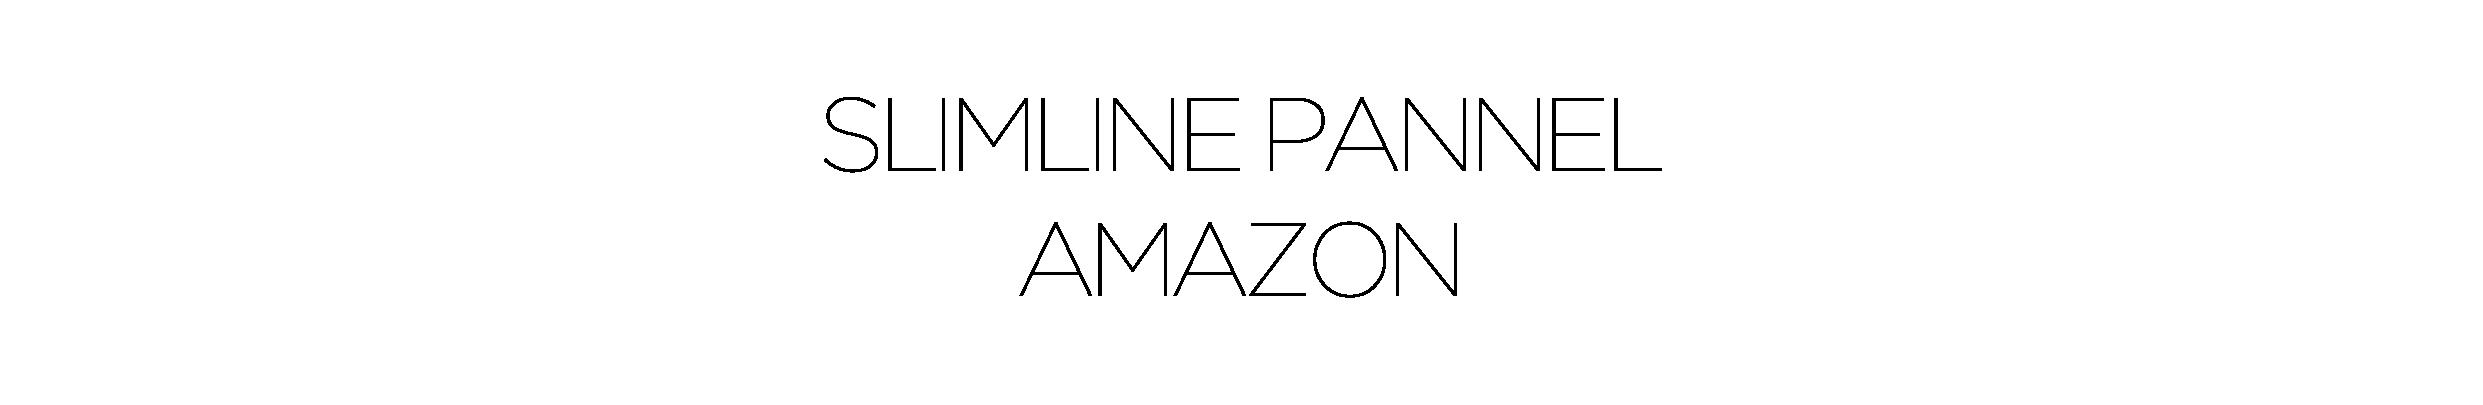 amazon-11